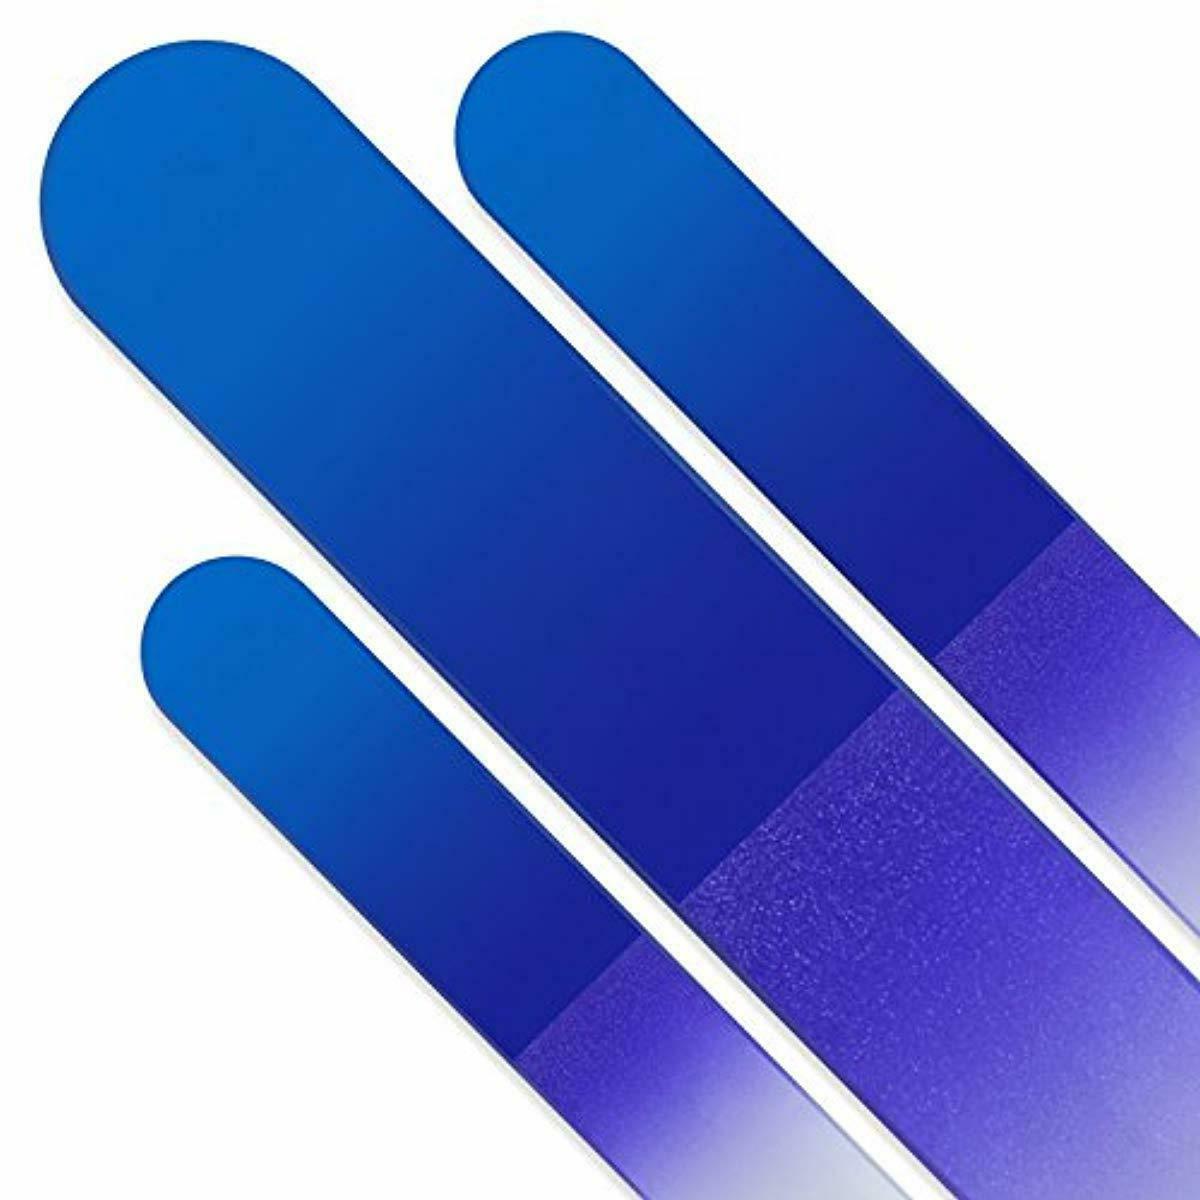 Mont Bleu of Crystal Files